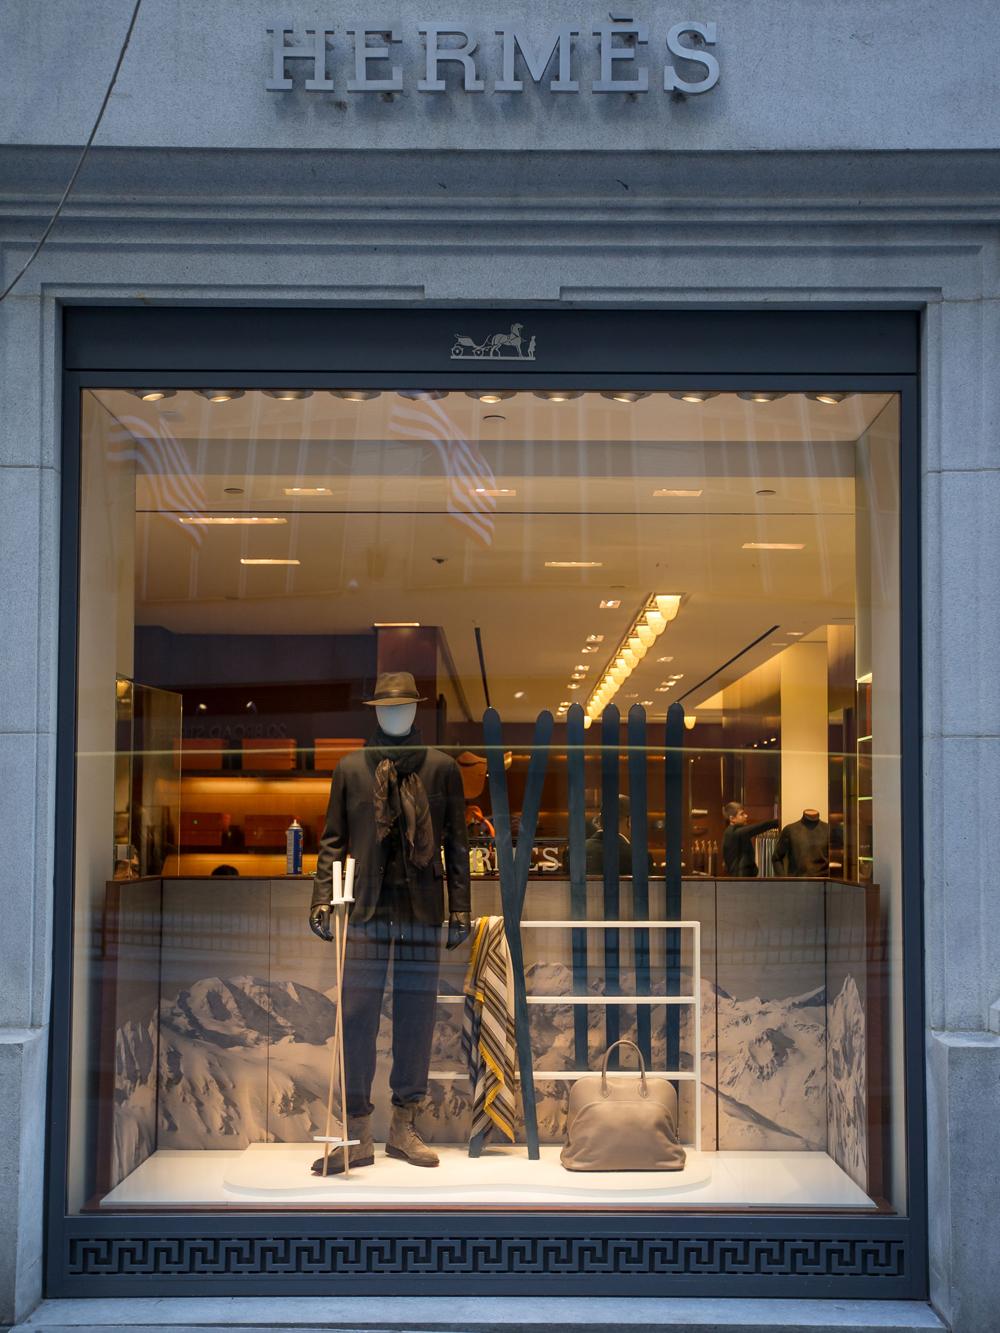 Hermès storefront, image via Getty